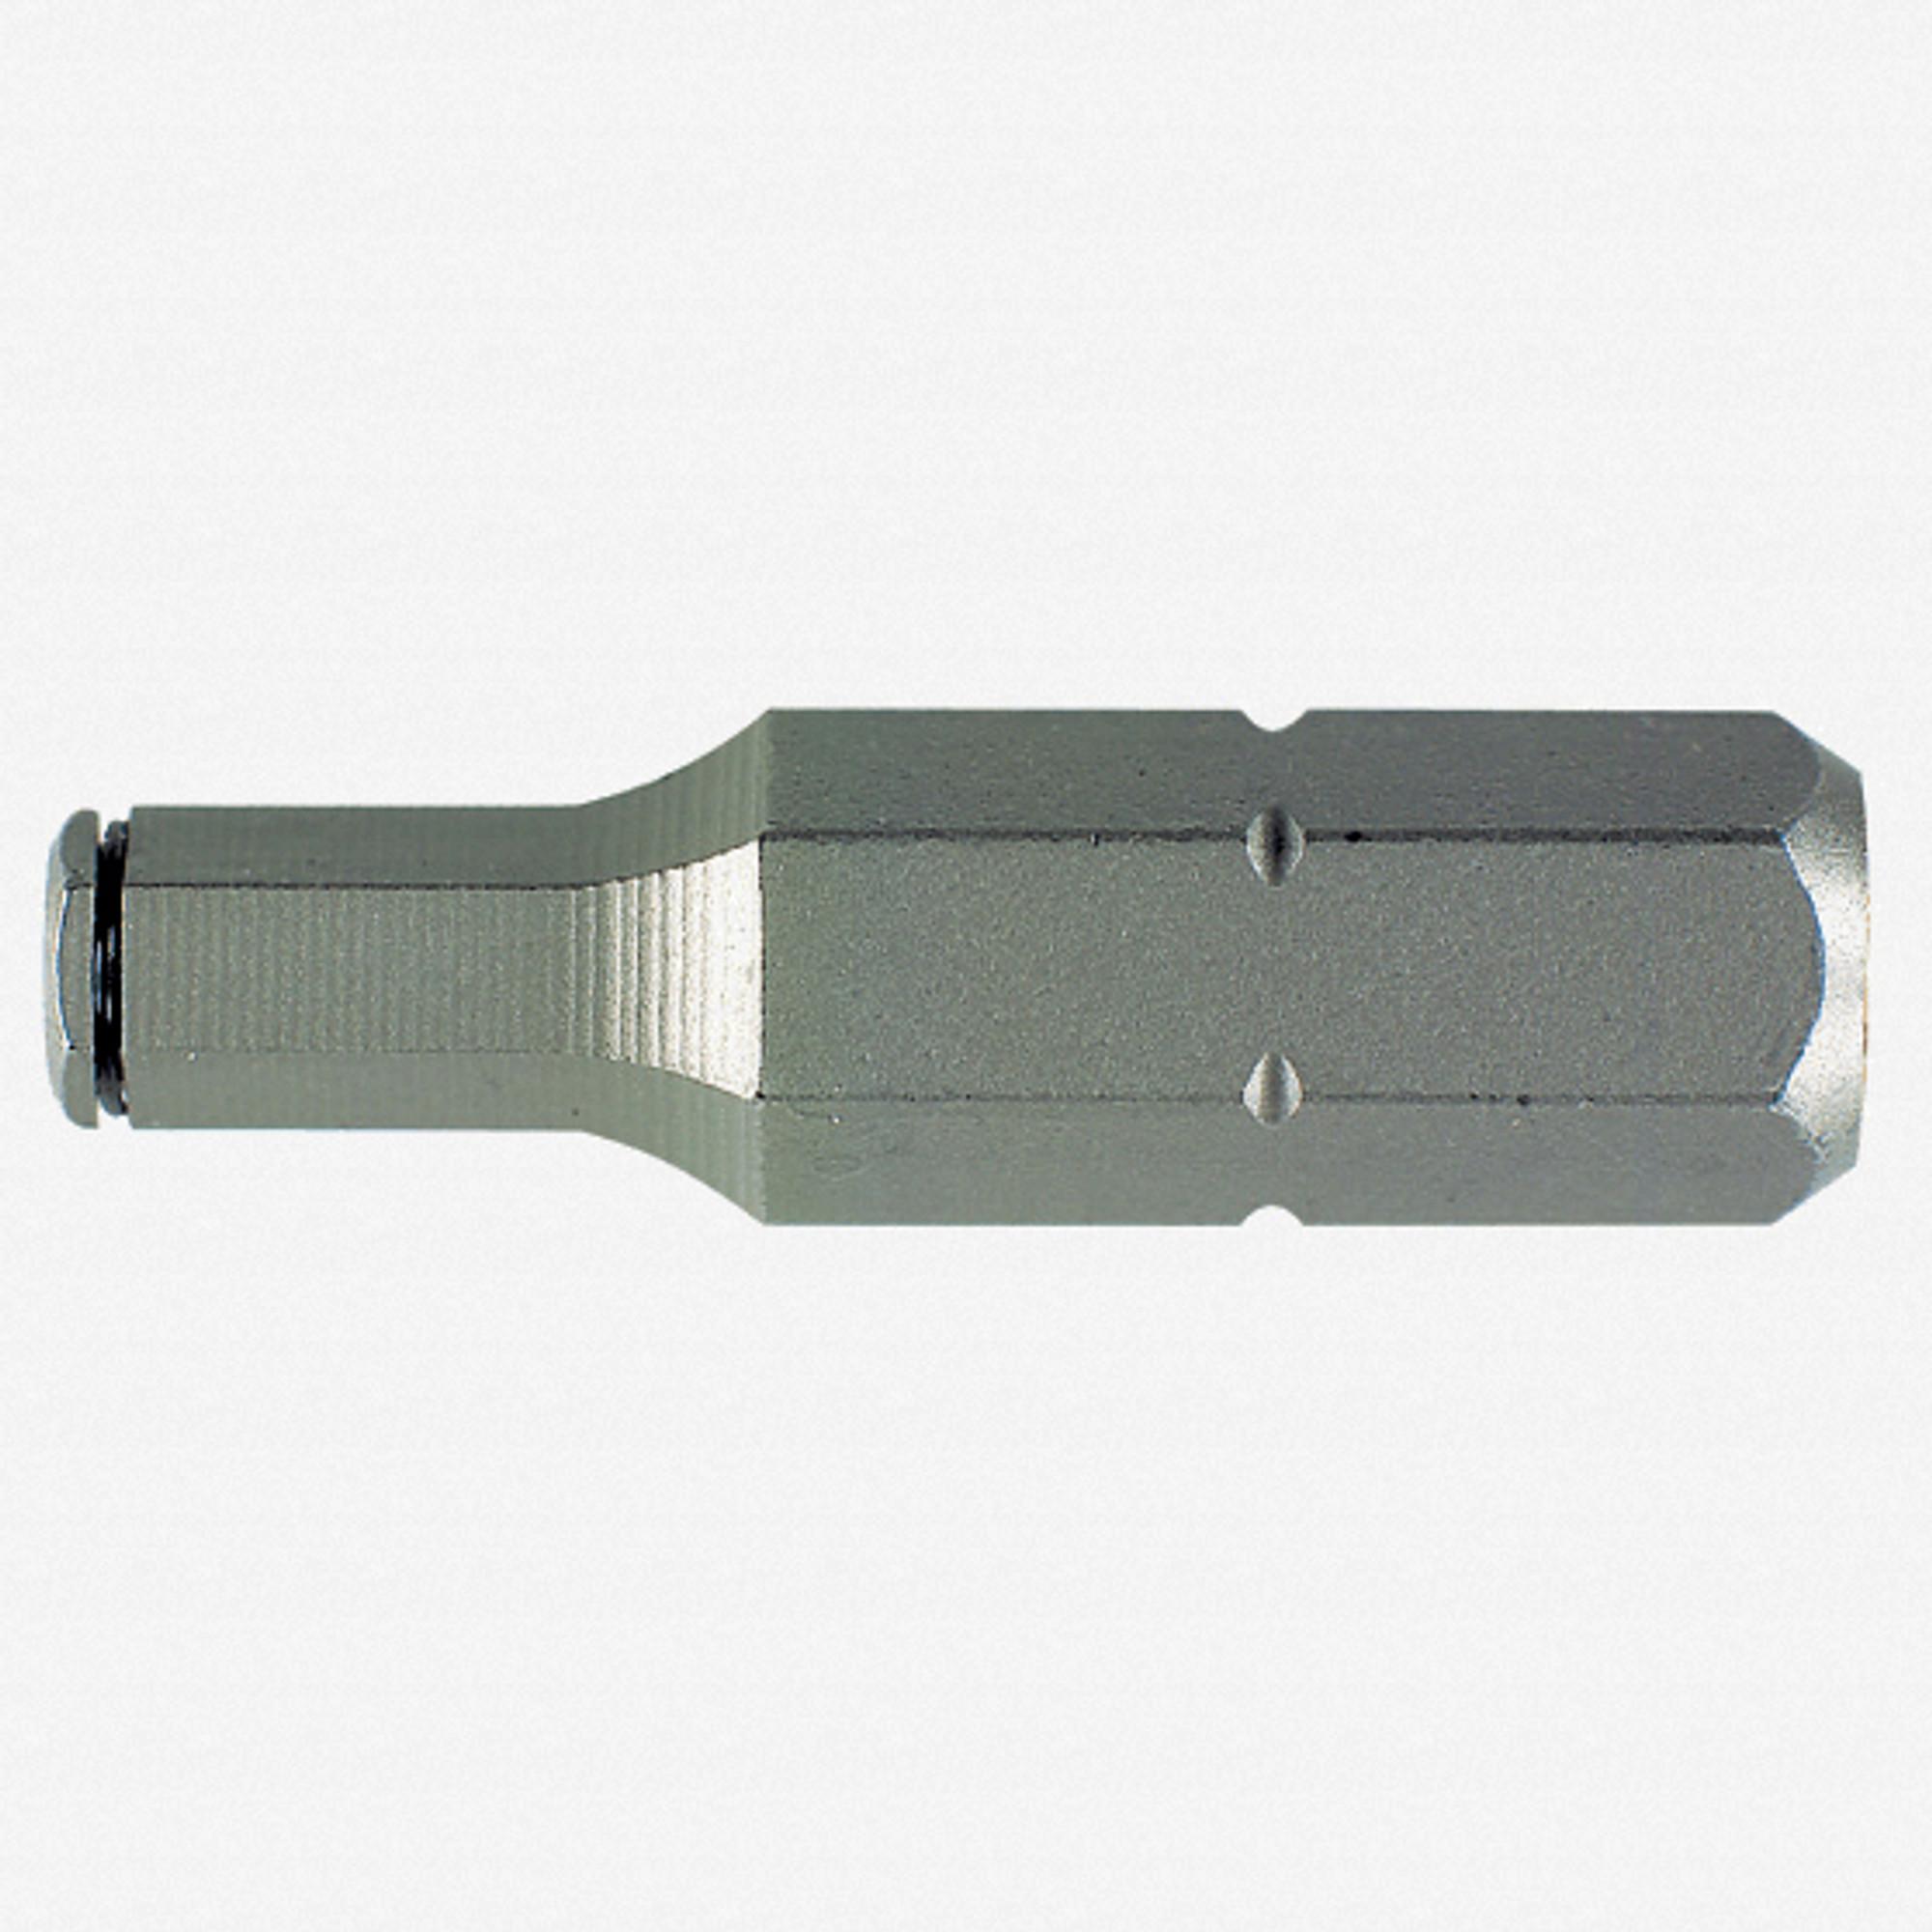 4.0mm x 25mm Wiha 71307 MagicRing® Hex Metric Insert Bit